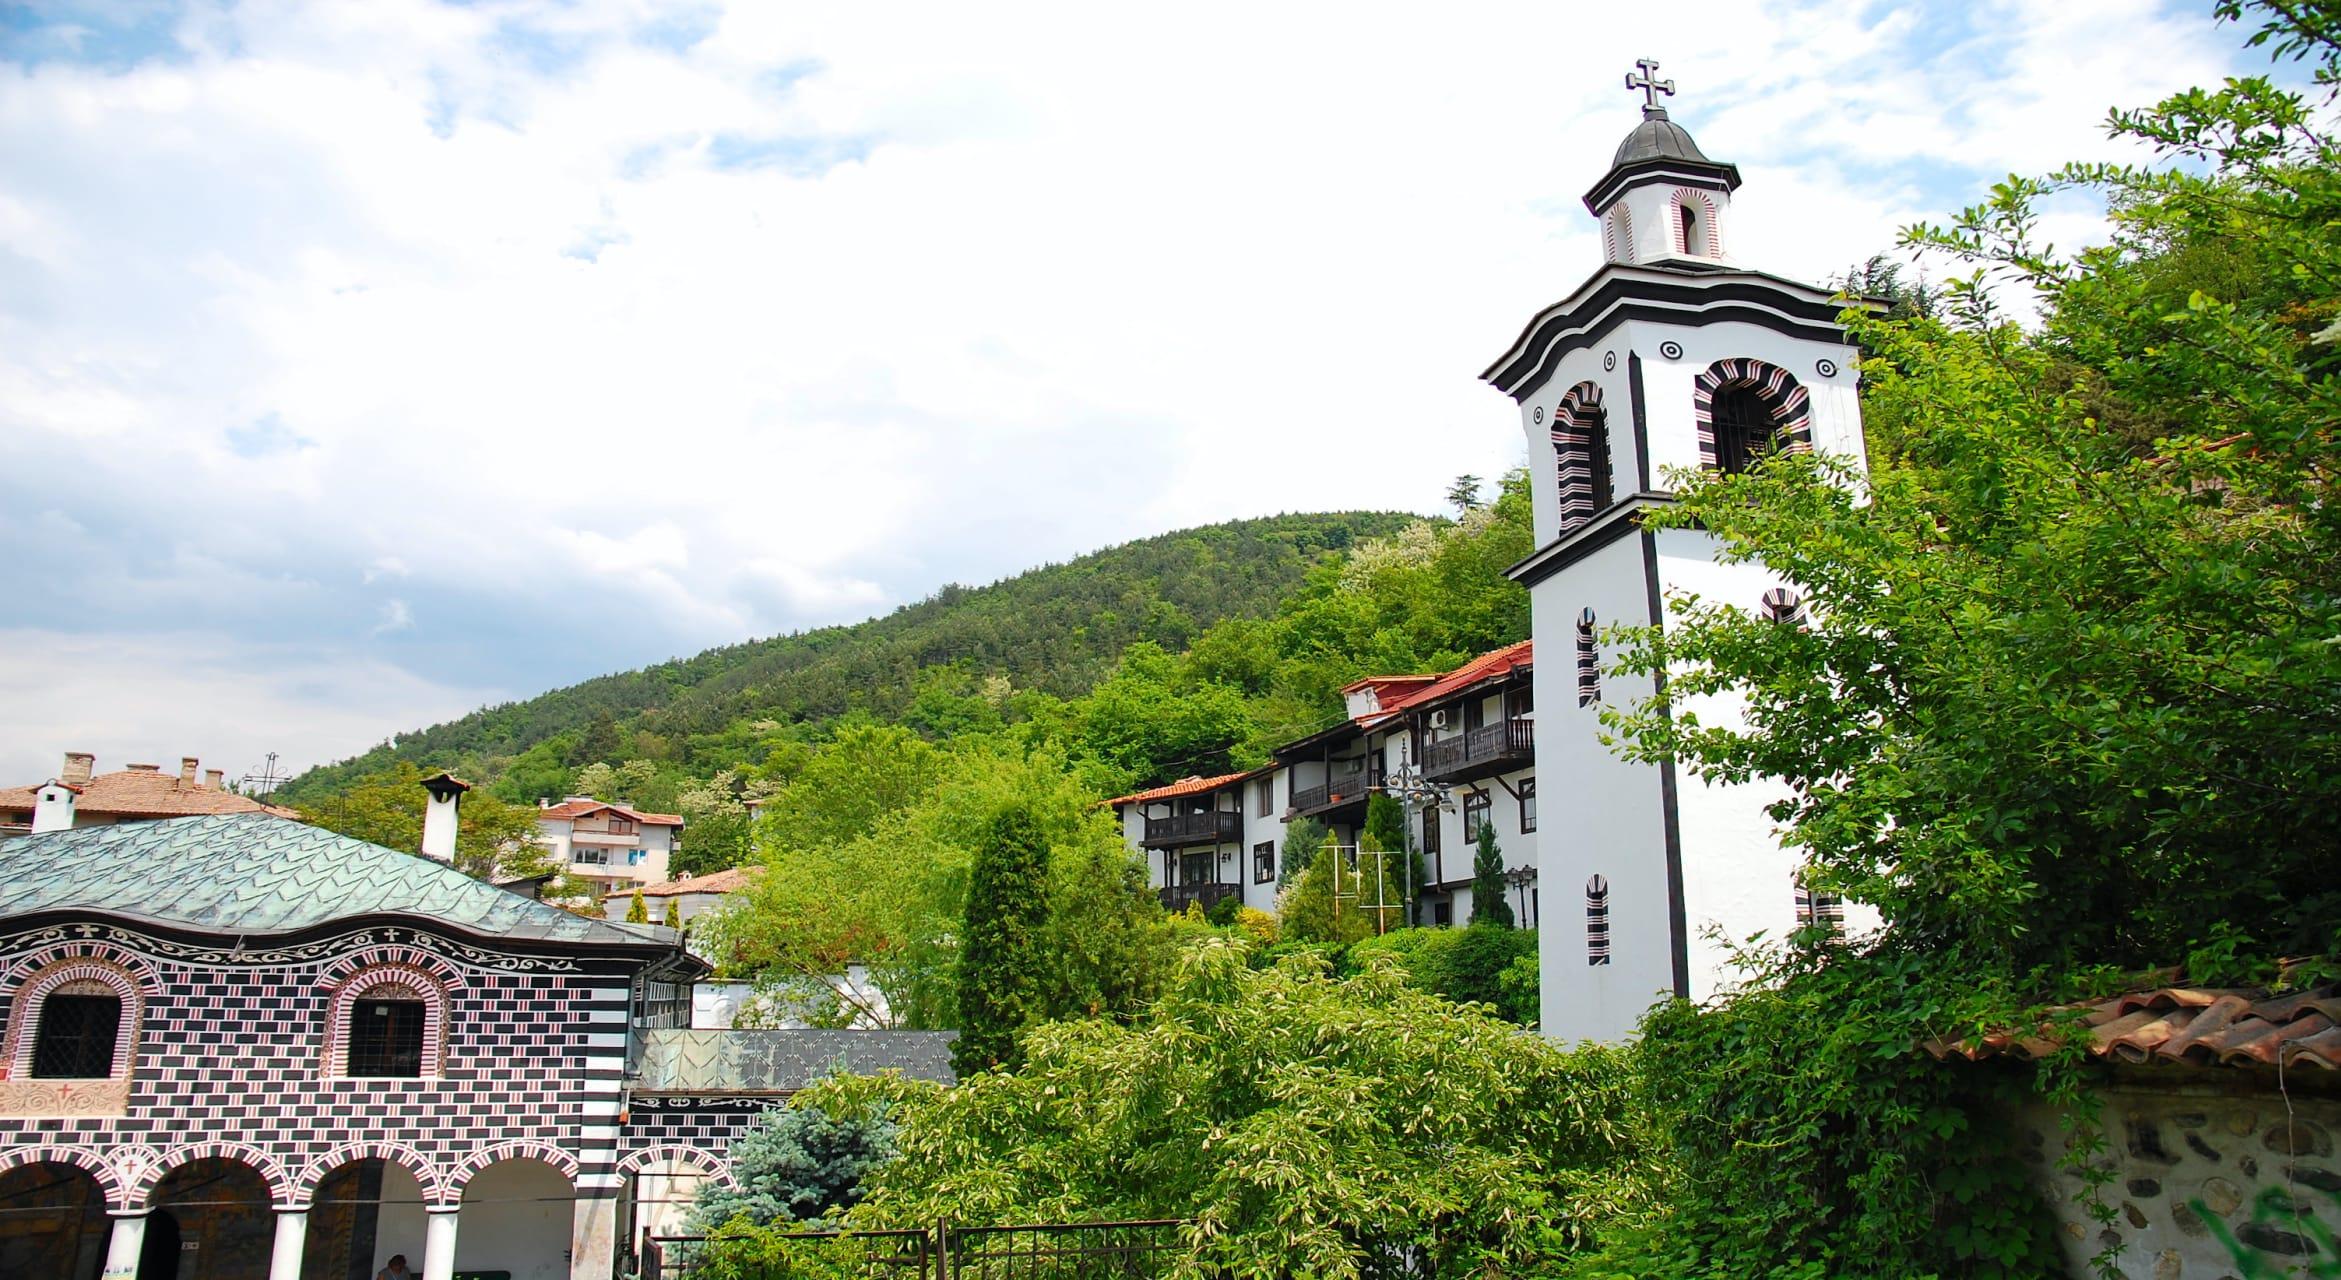 Blagoevgrad - Bulgarian Renaissance in Stone